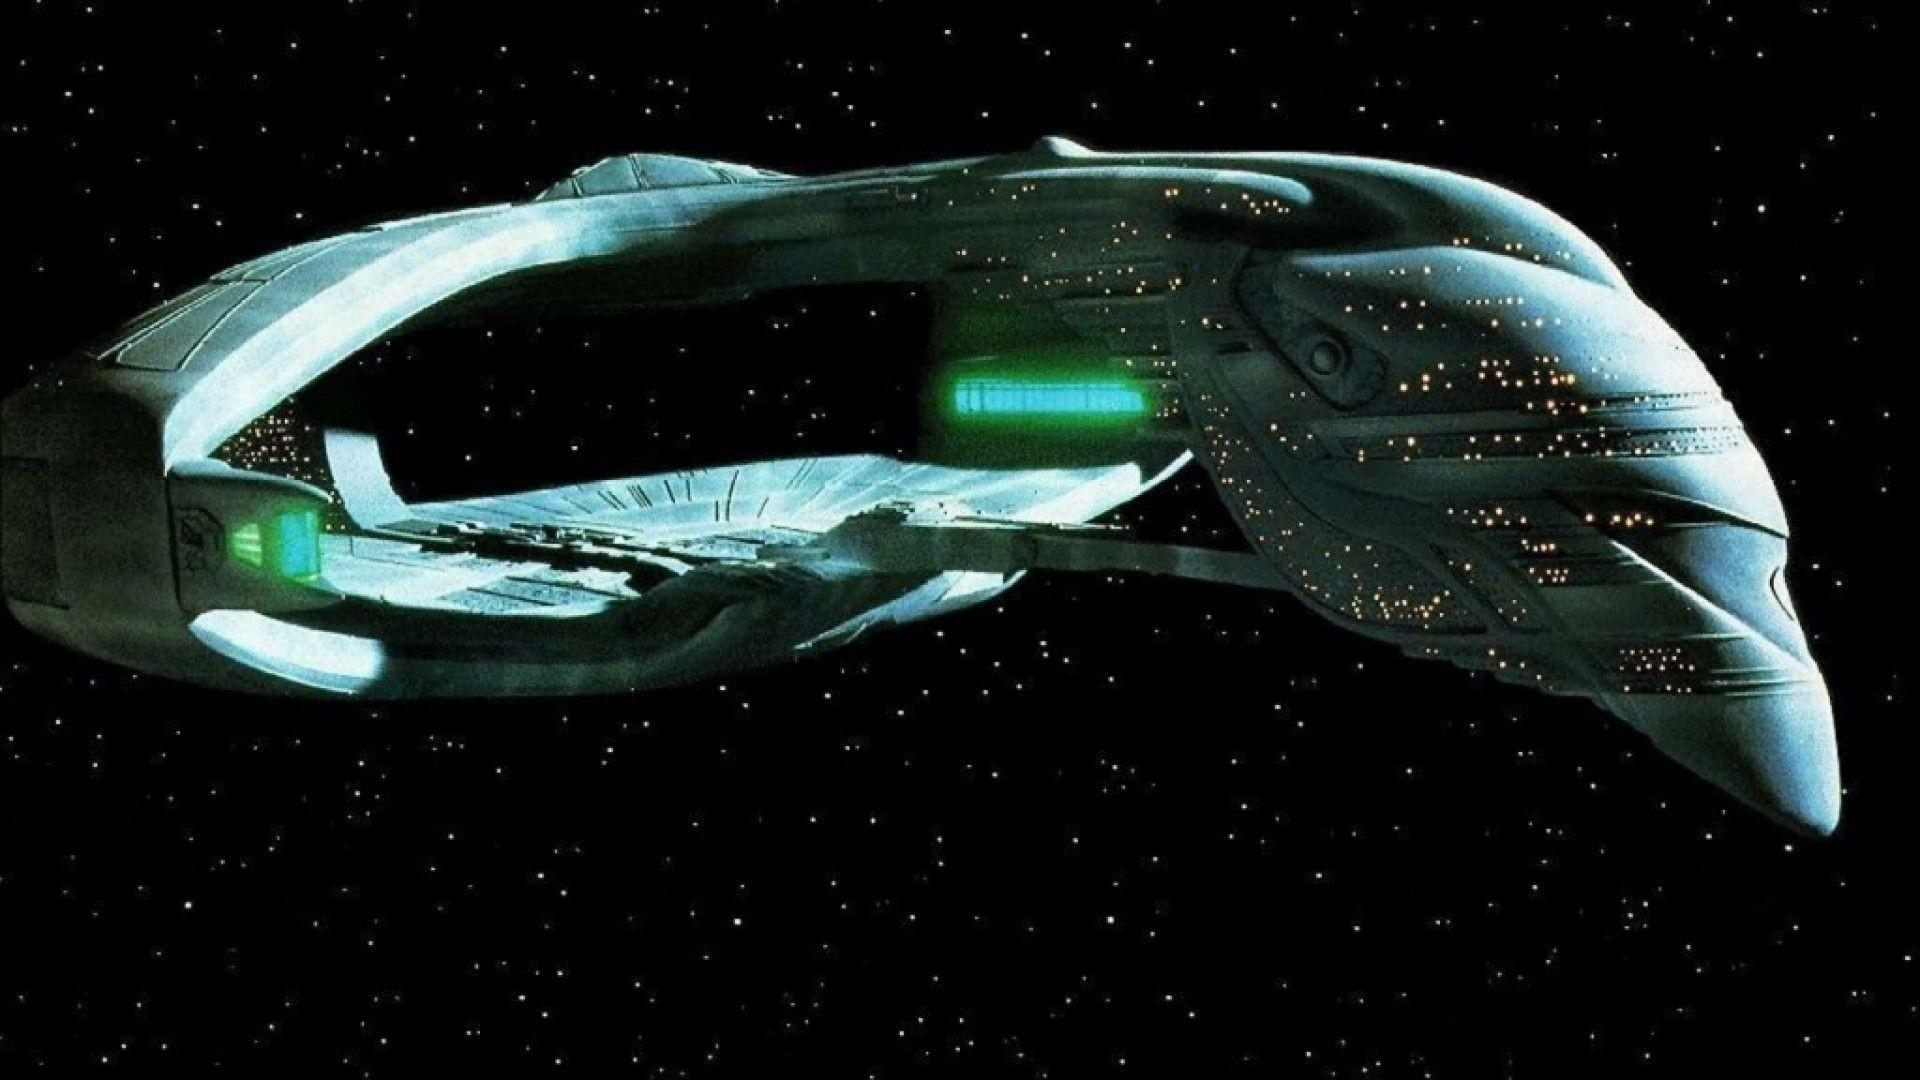 0 Star Trek Wallpaper High Resolution Star Trek Wallpapers 1080p